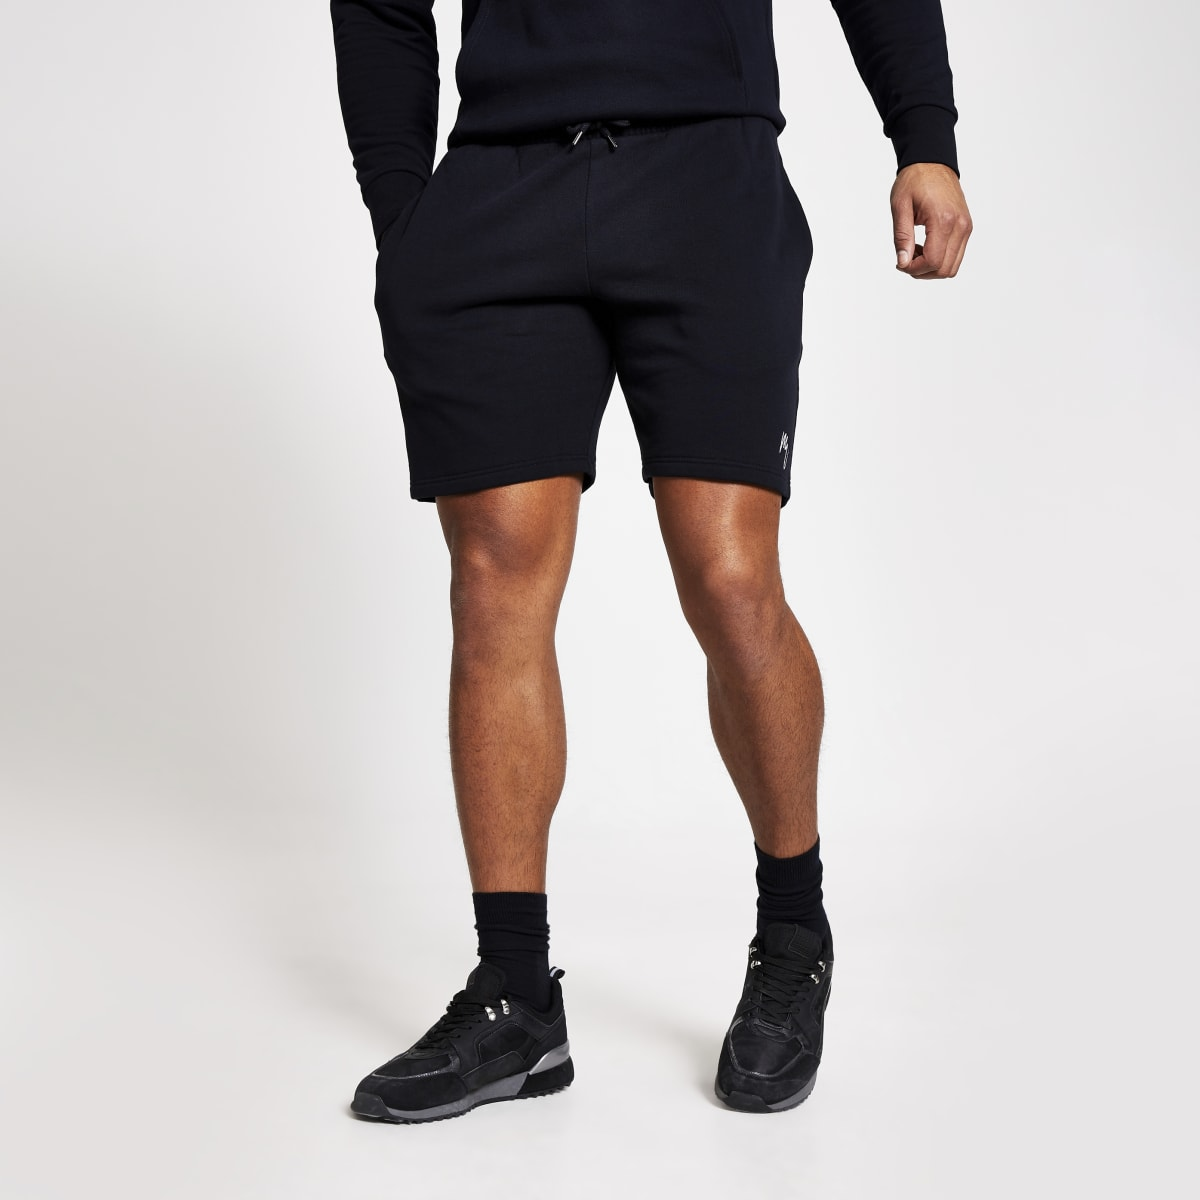 Maison Riviera - Marineblauwe slim-fit shorts